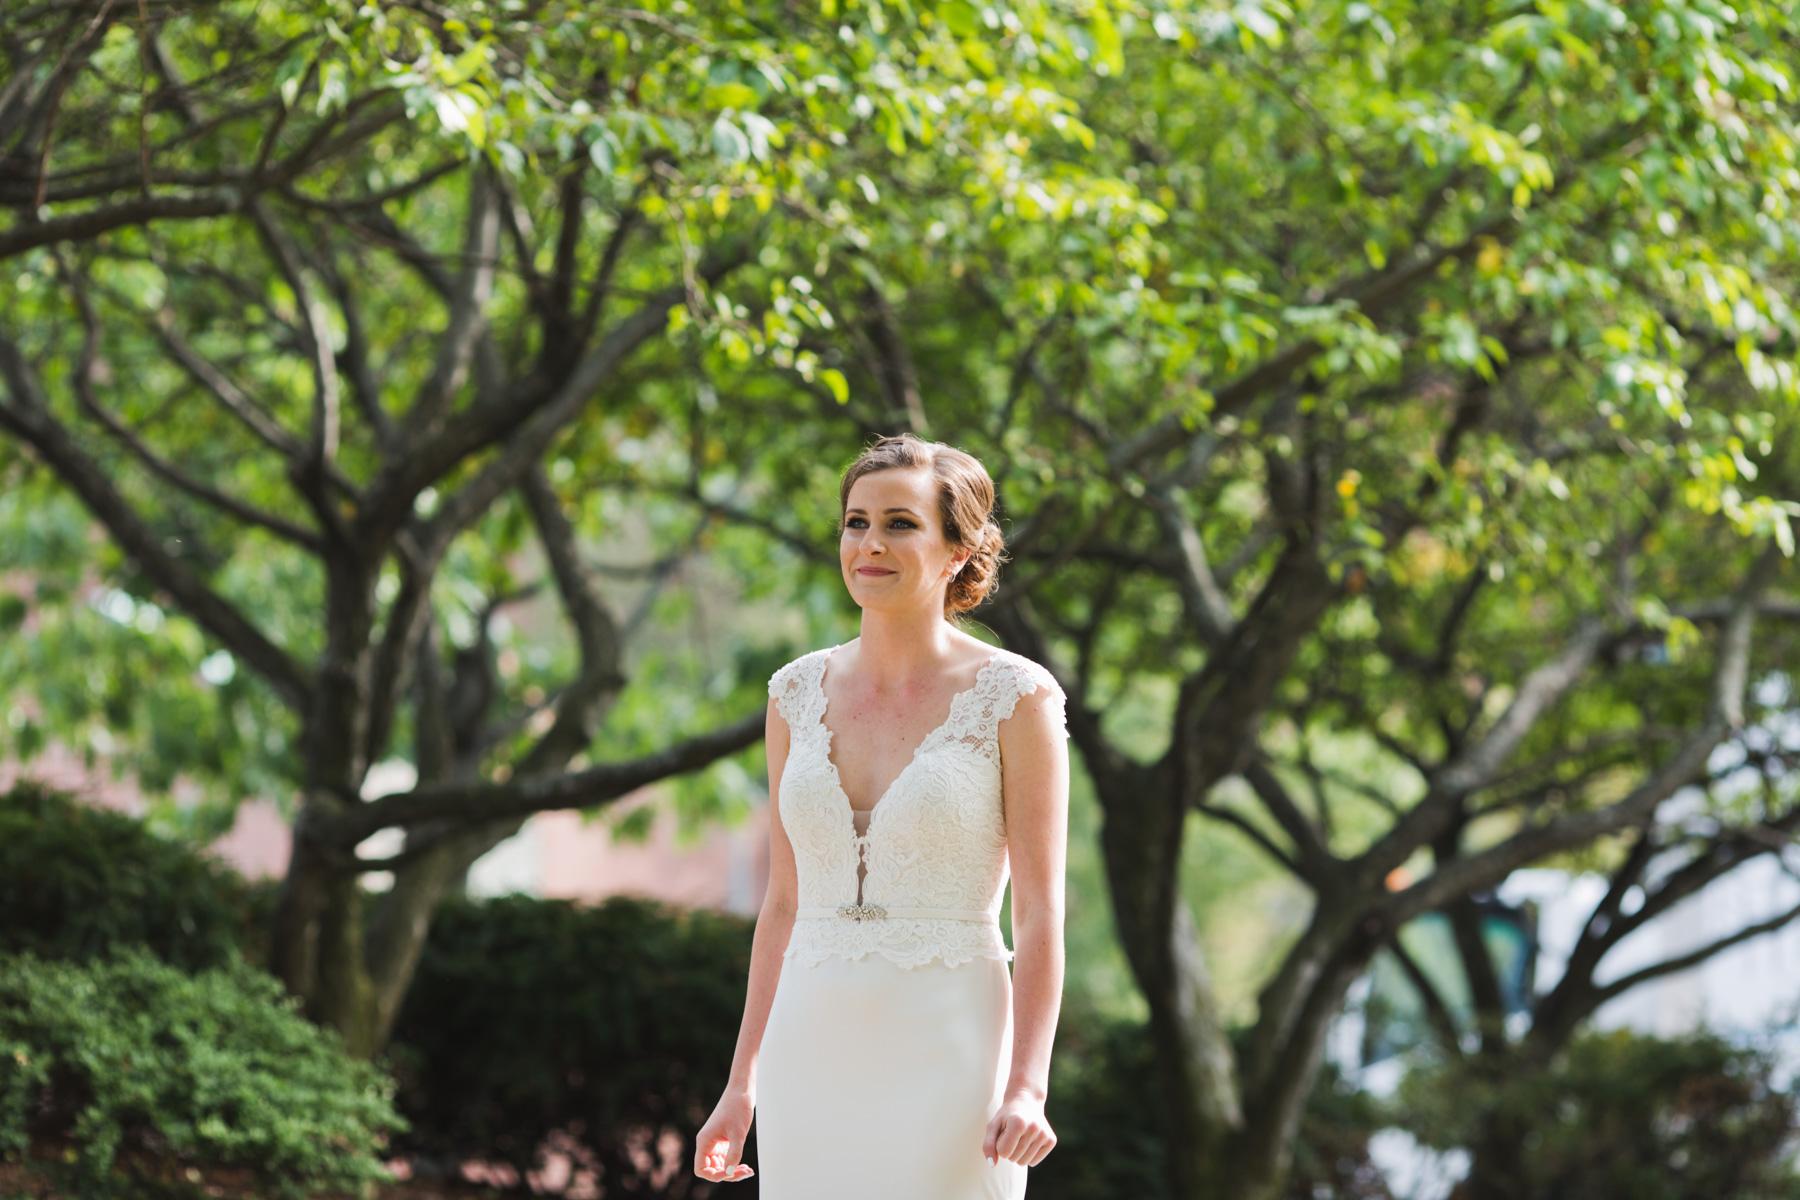 nervous bride waiting